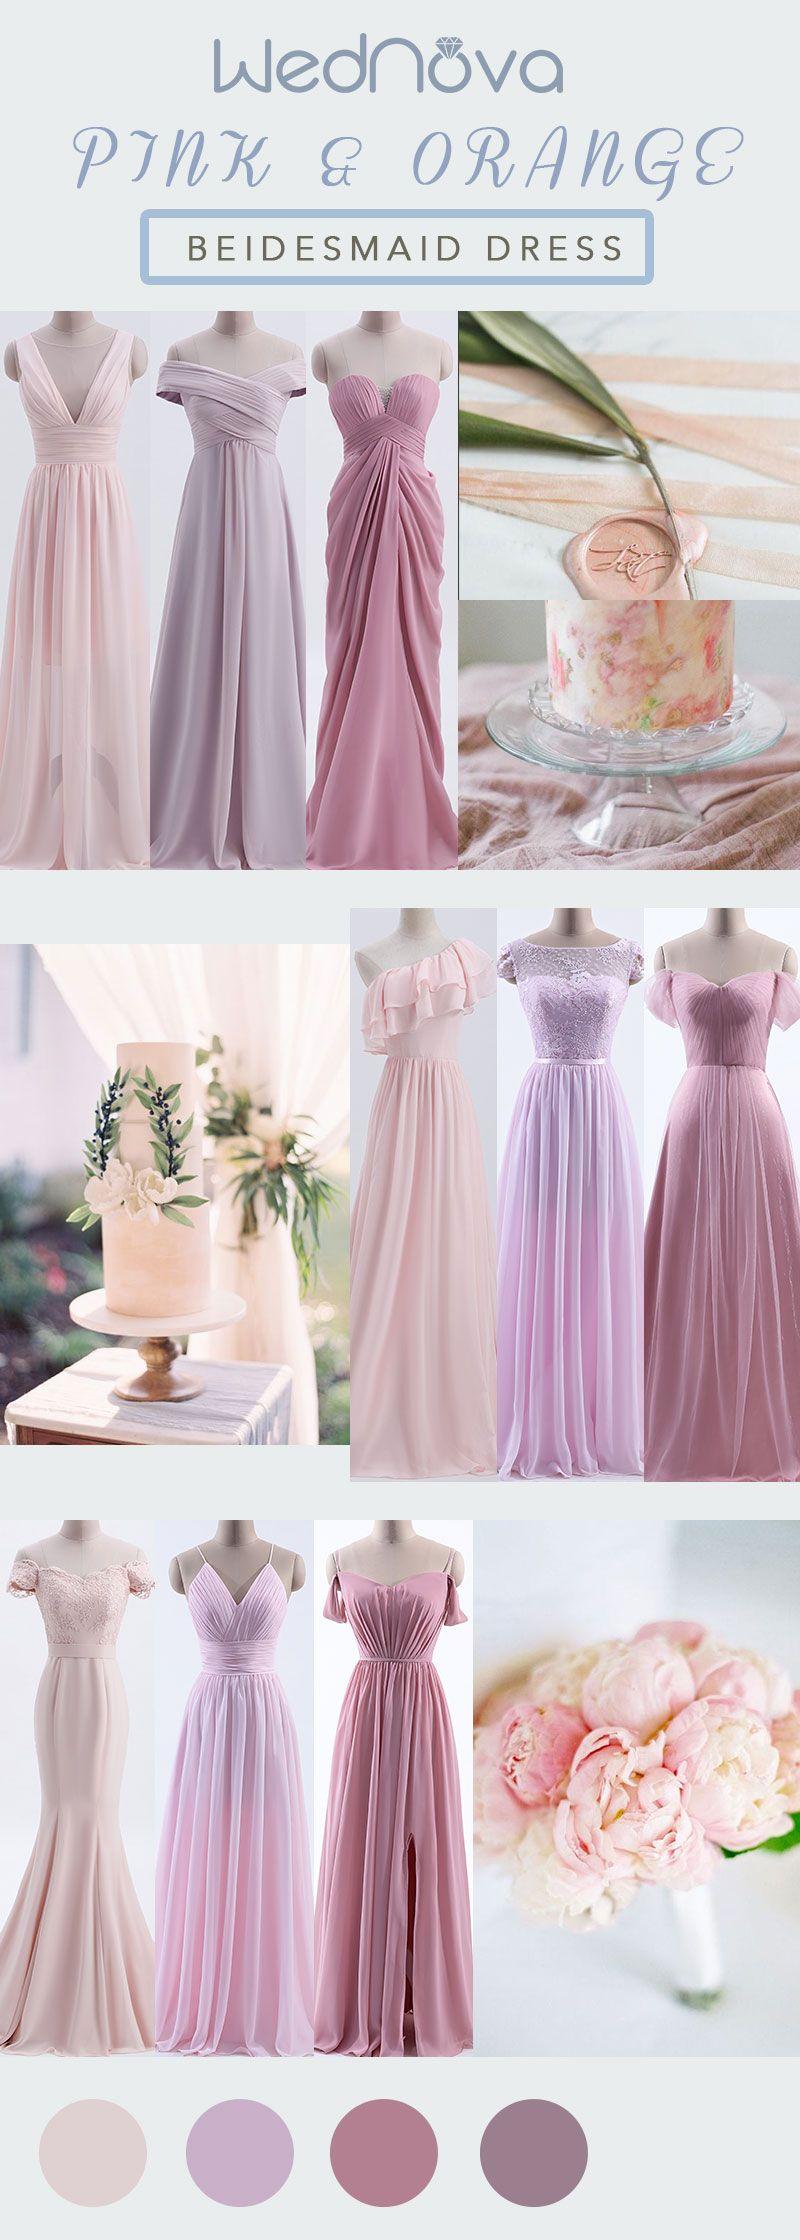 Wedding decorations white november 2018 Sexy pink bridesmaid dresses new styles chiffon a line dress free